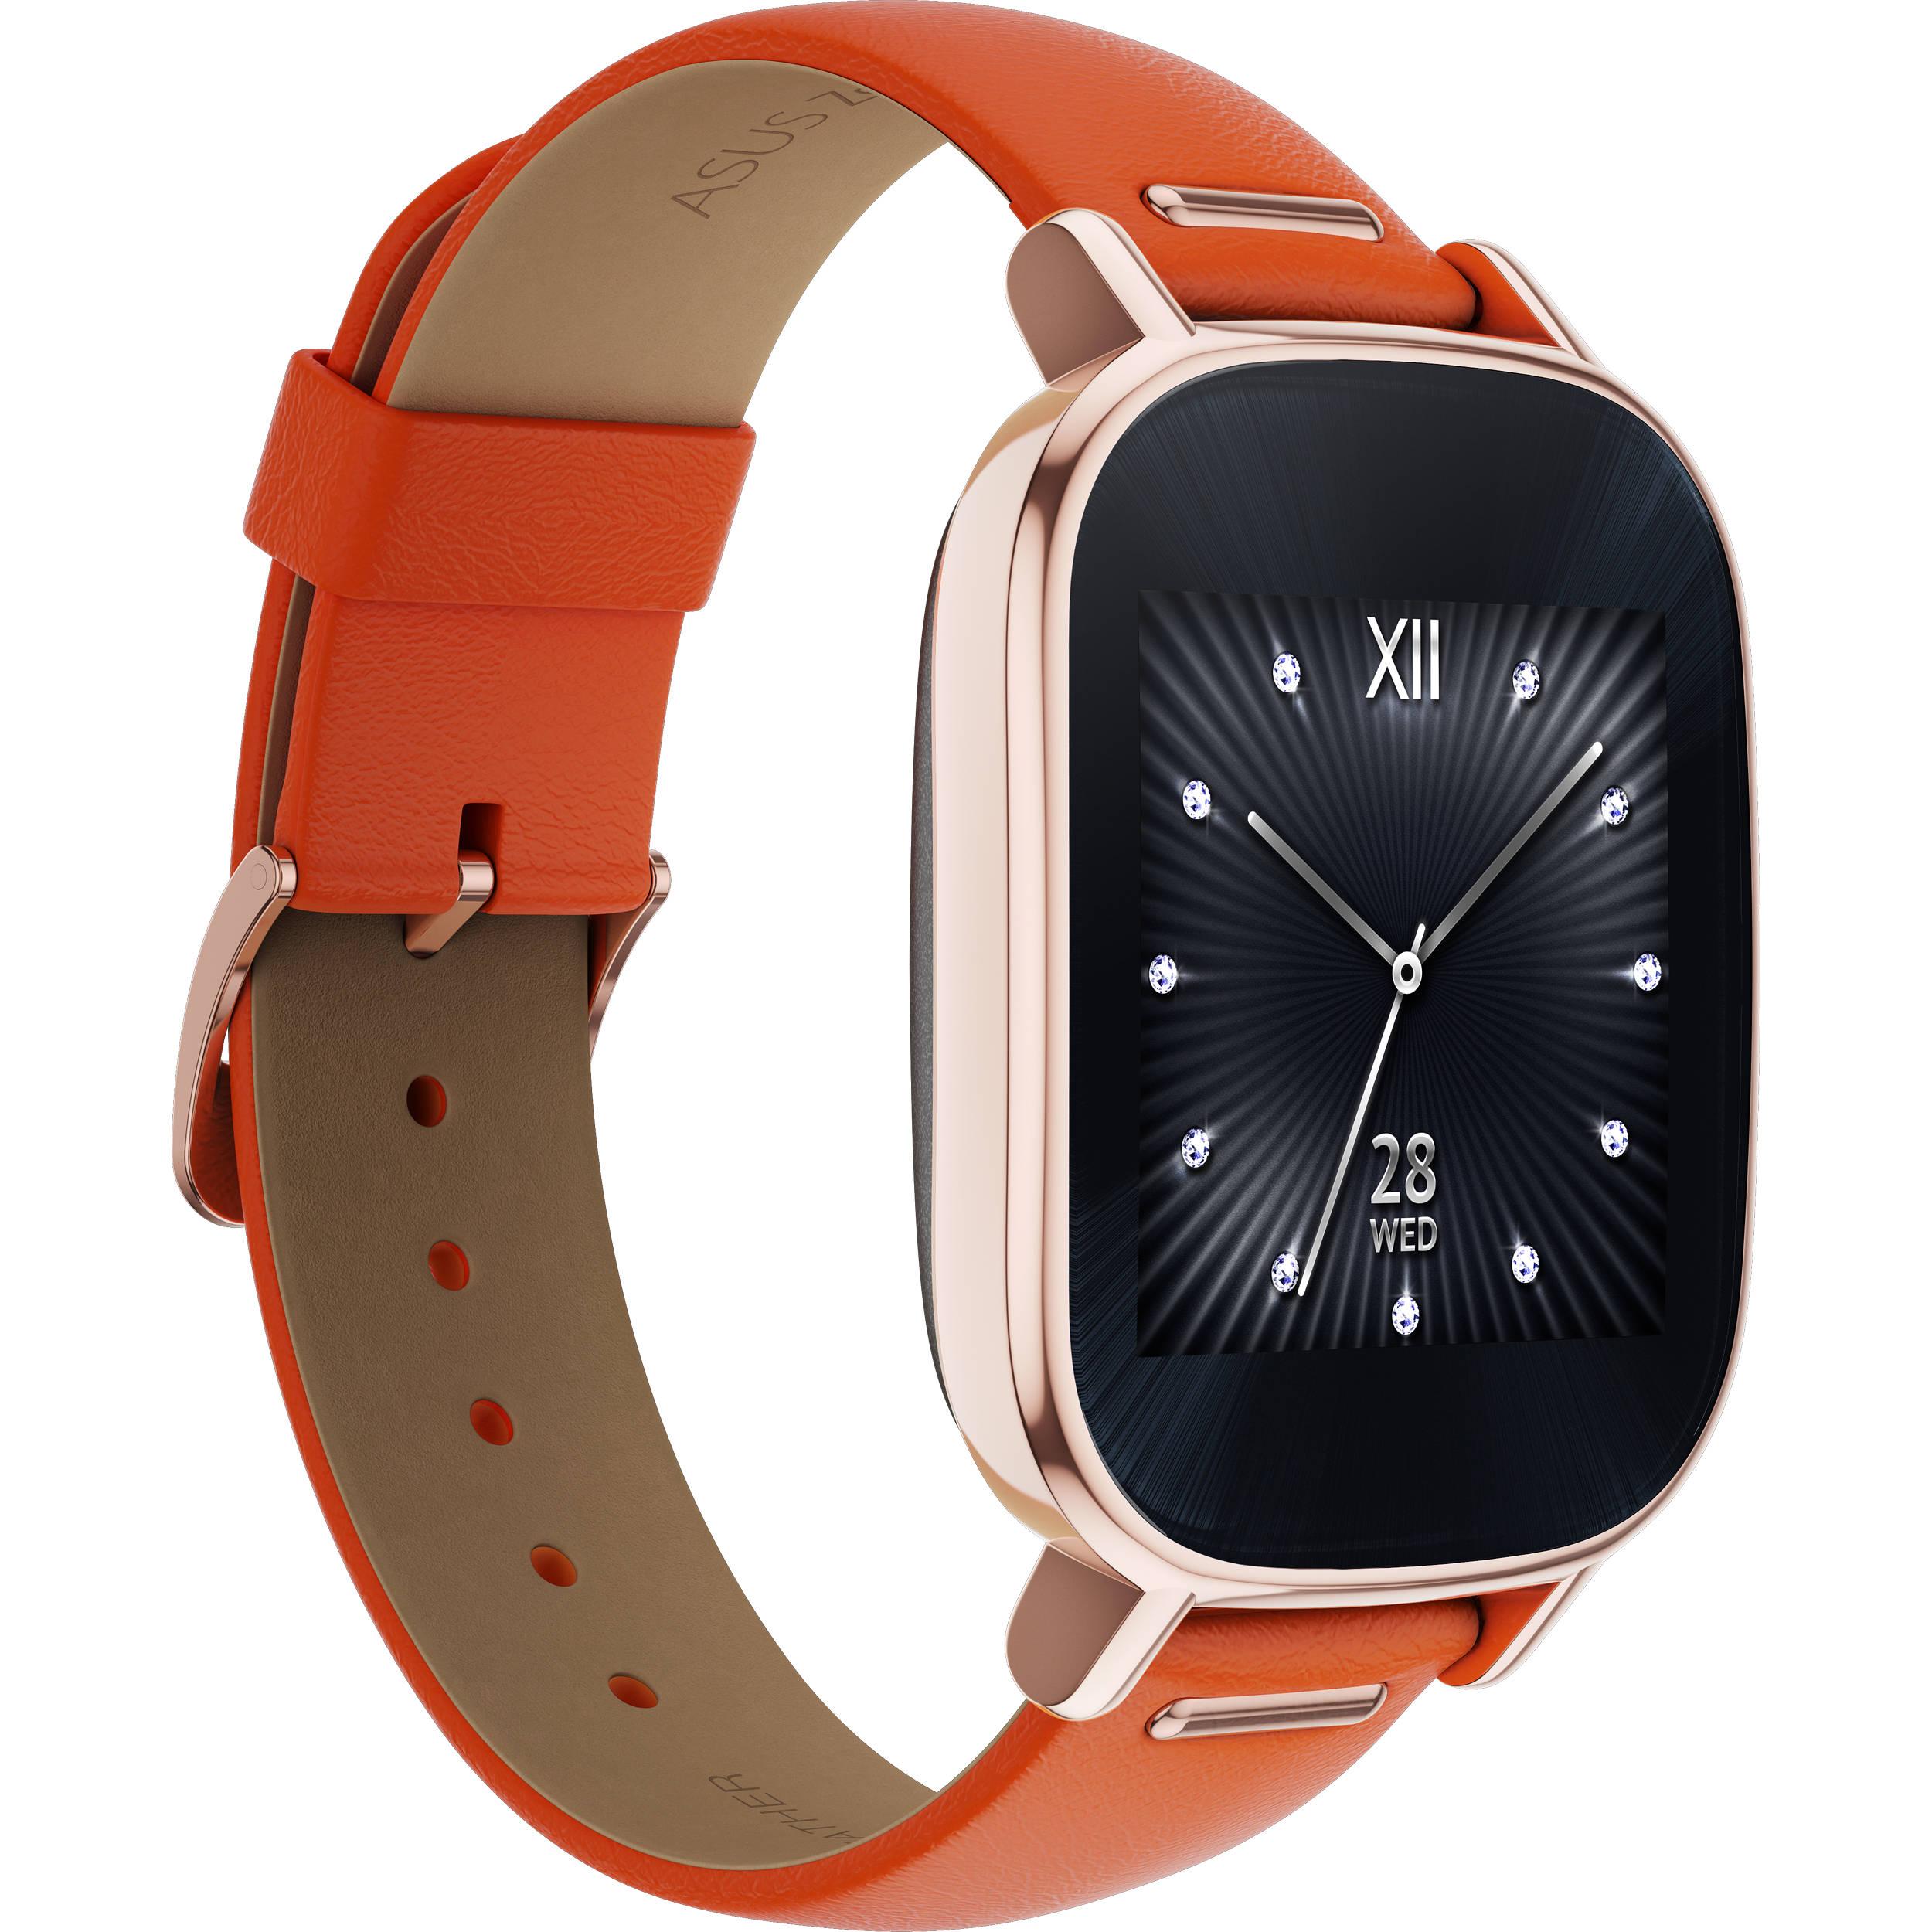 "ASUS ZenWatch 2 1.45"" Smartwatch WI502Q-RL-OG-Q B&H Photo"